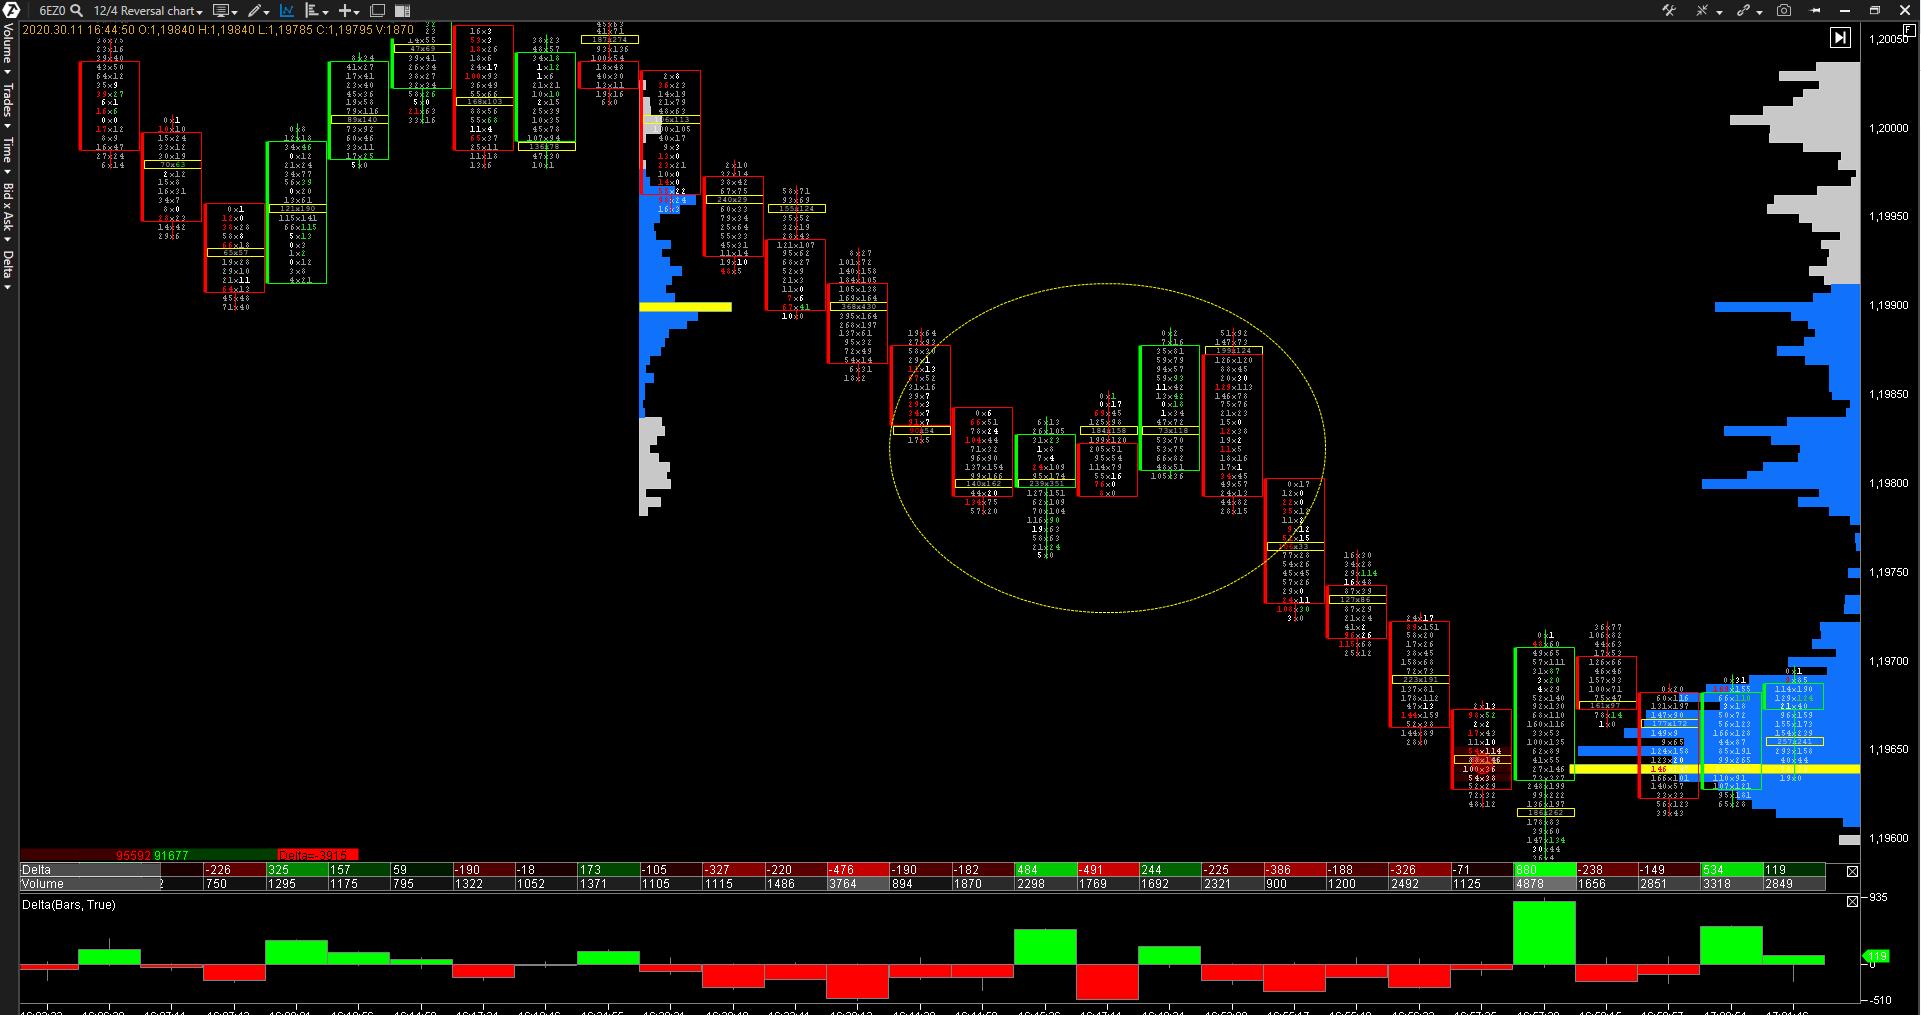 pauta-plana-trading-order-flow